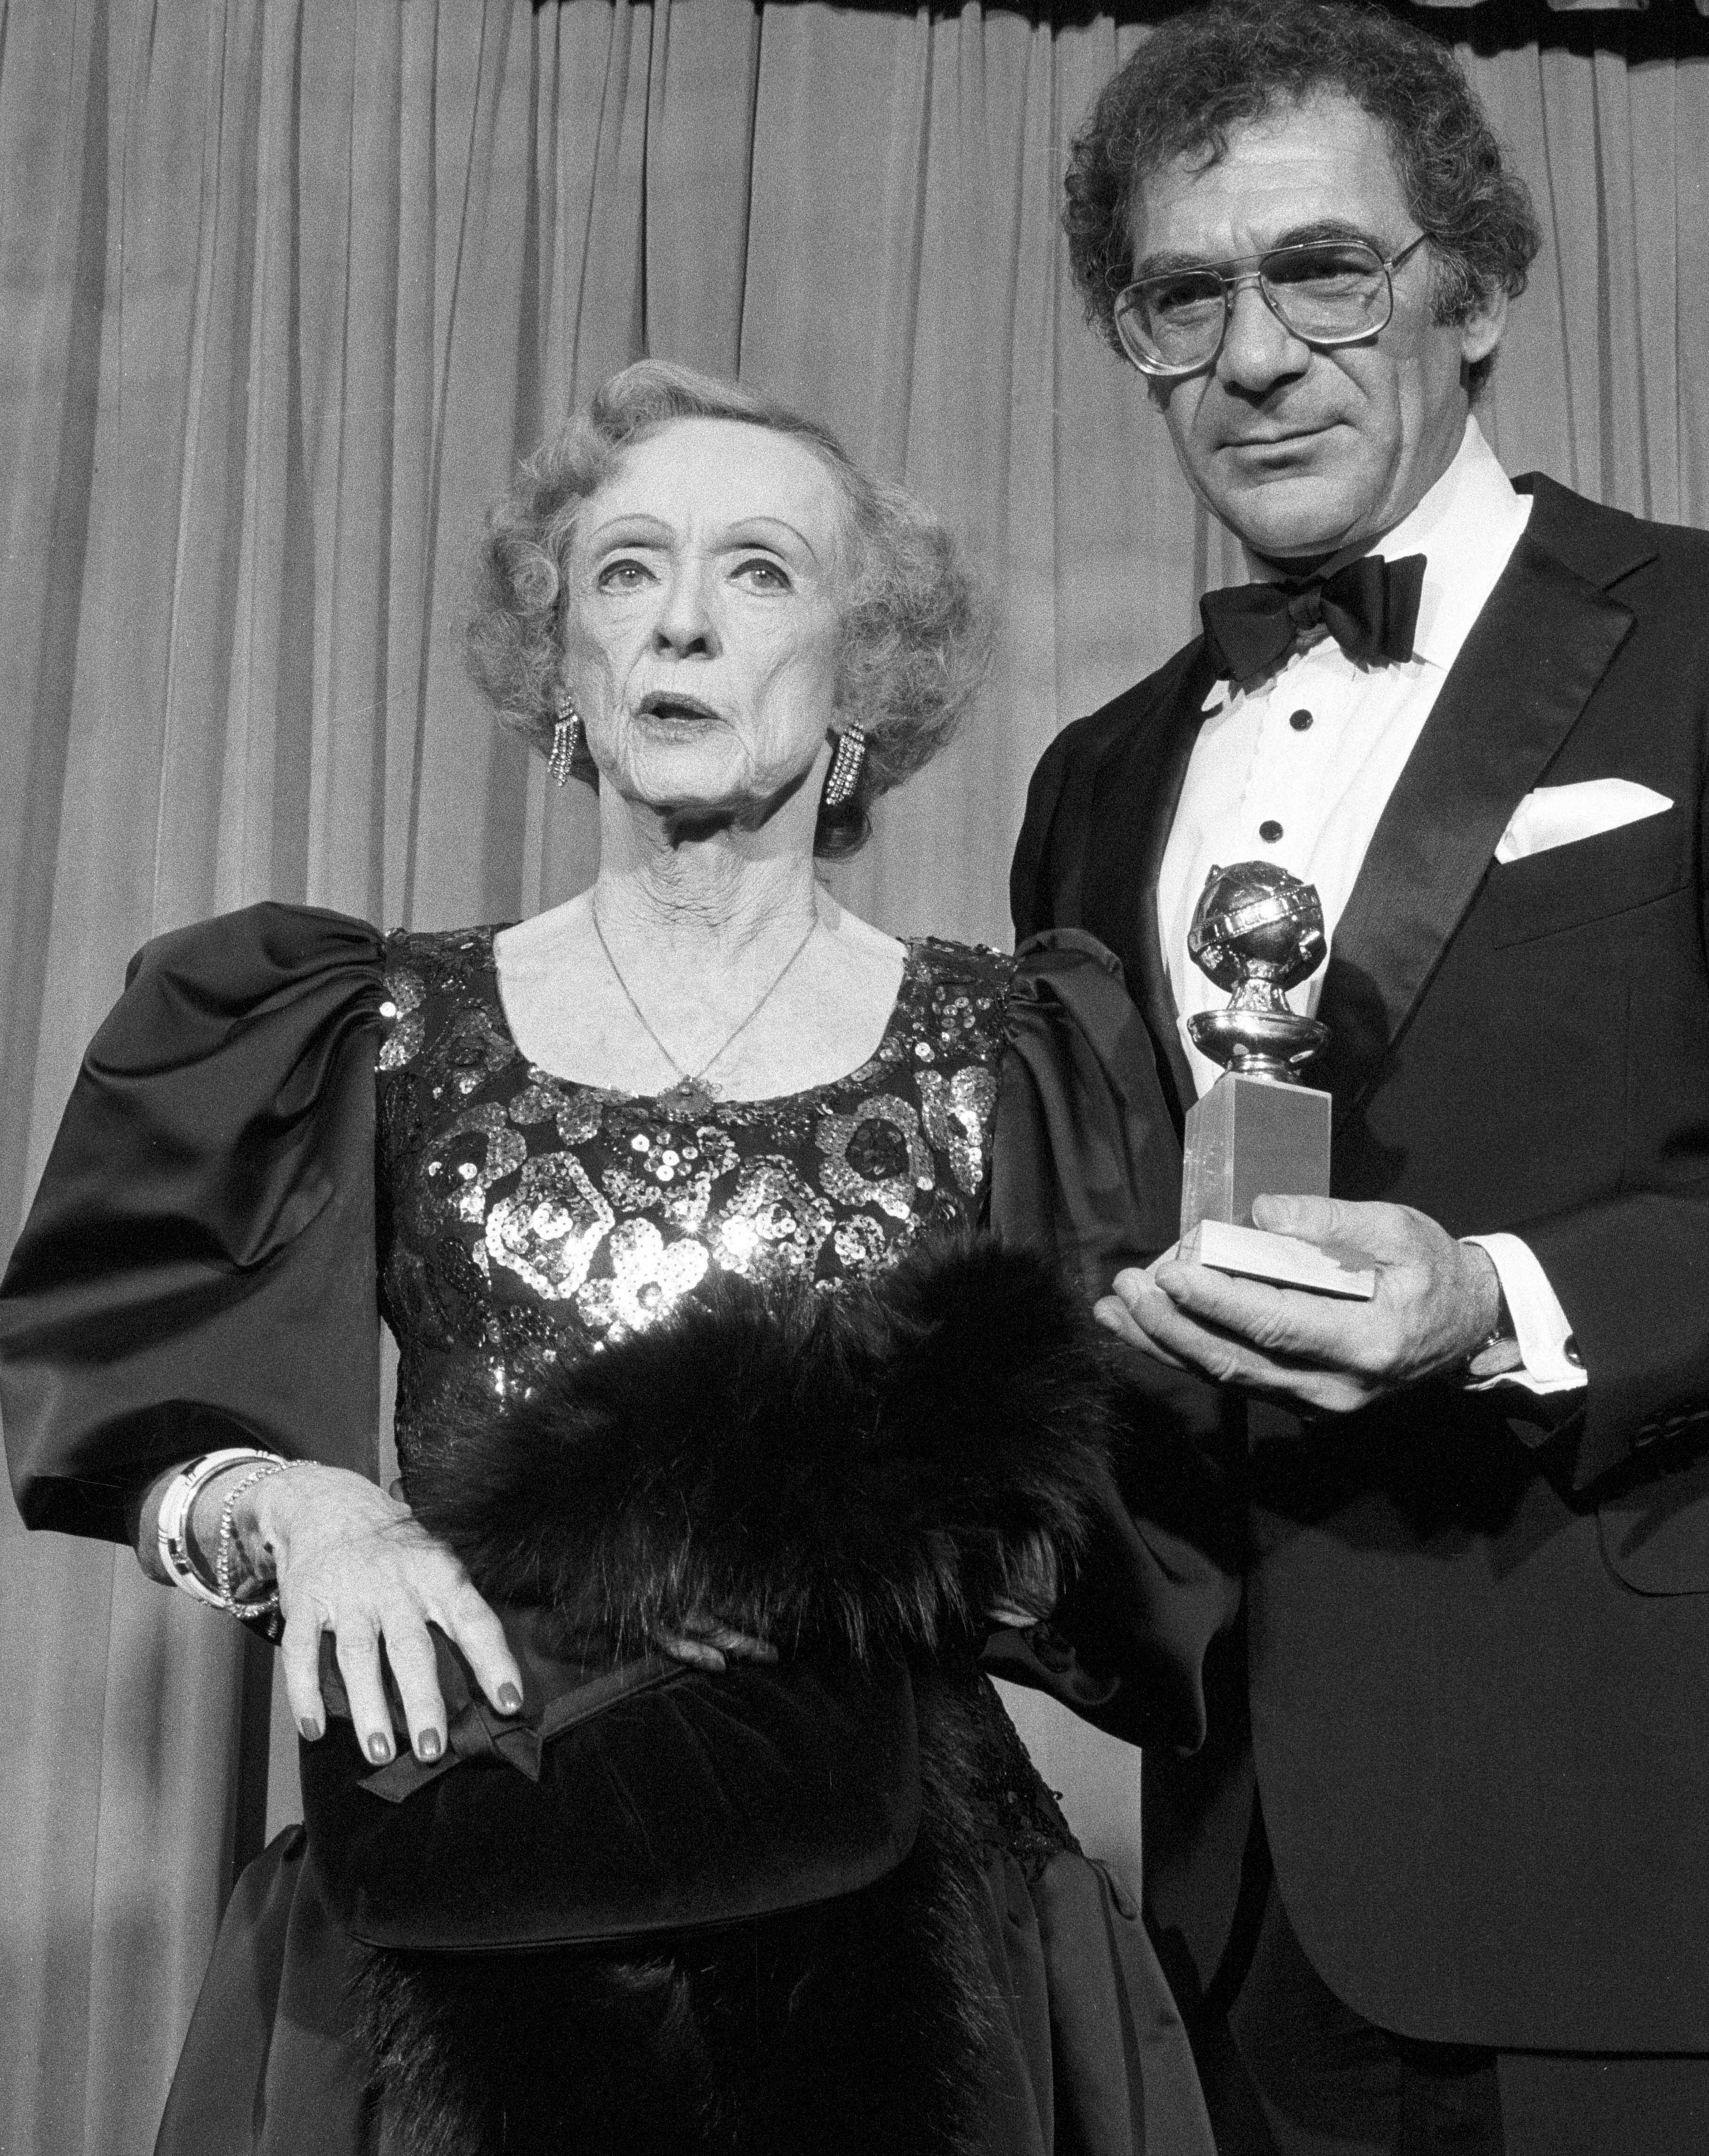 Bette Davis and Sydney Pollack, Golden Globes 1986